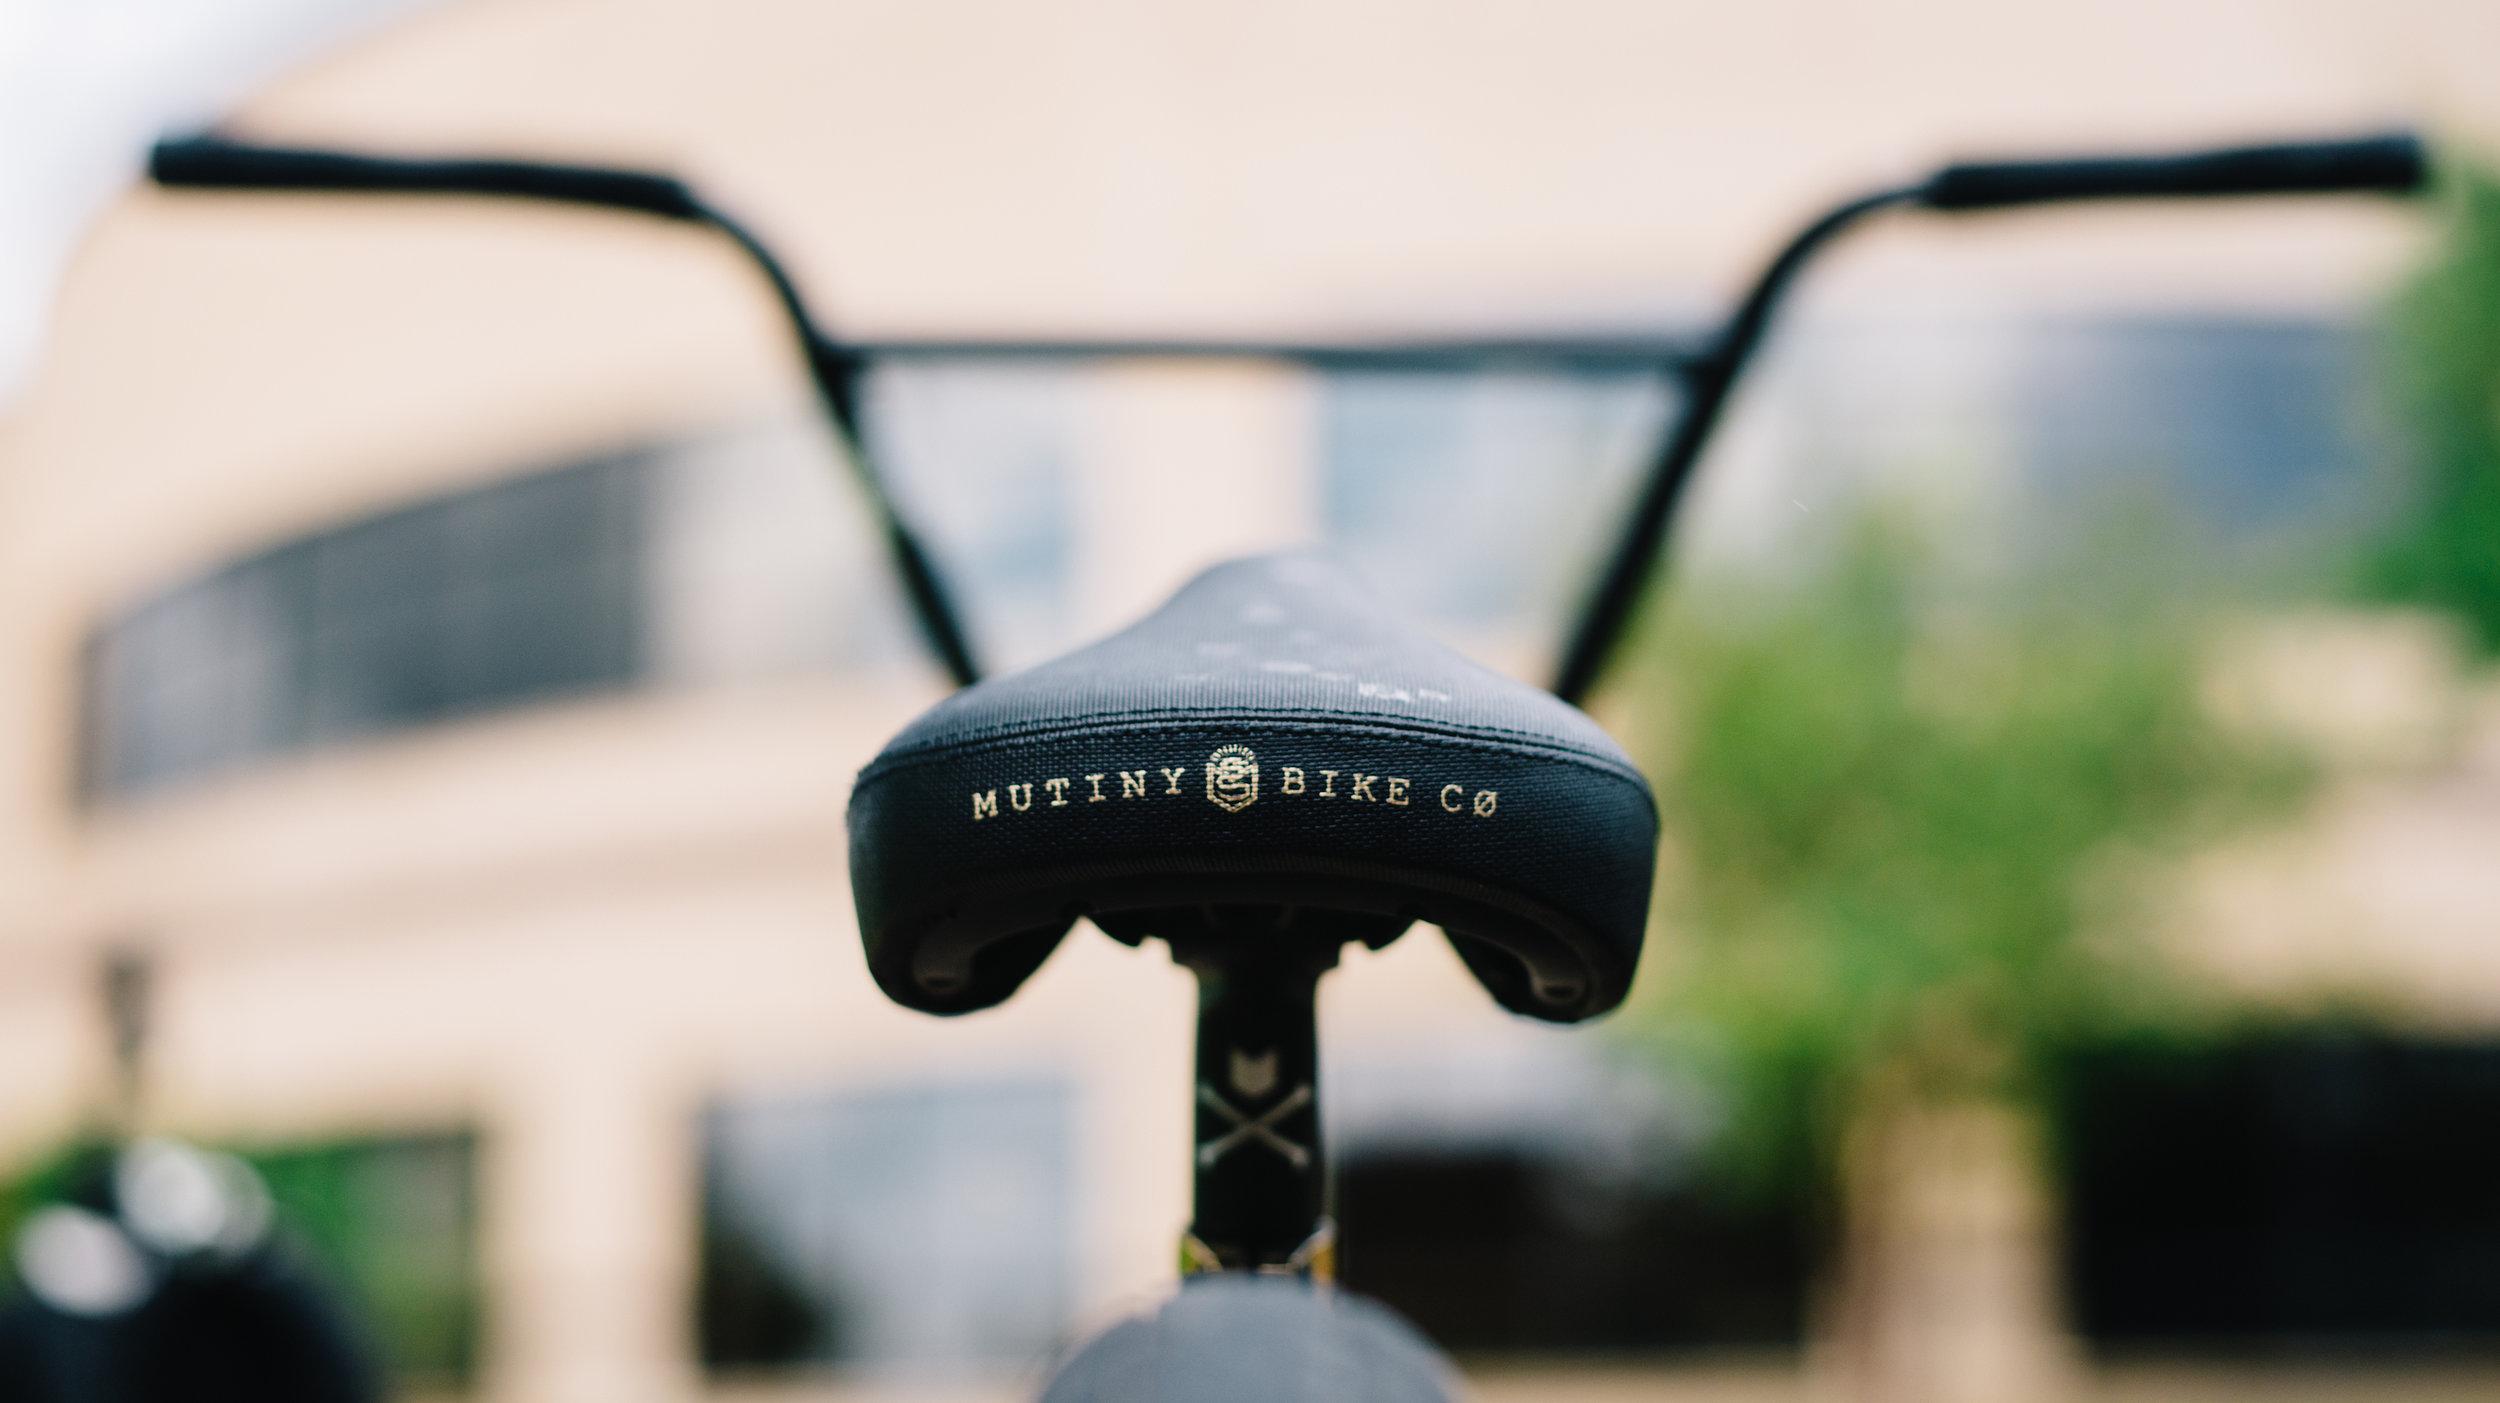 181128 Austin Brunger bike check KIRBY HALF RES_11.jpg